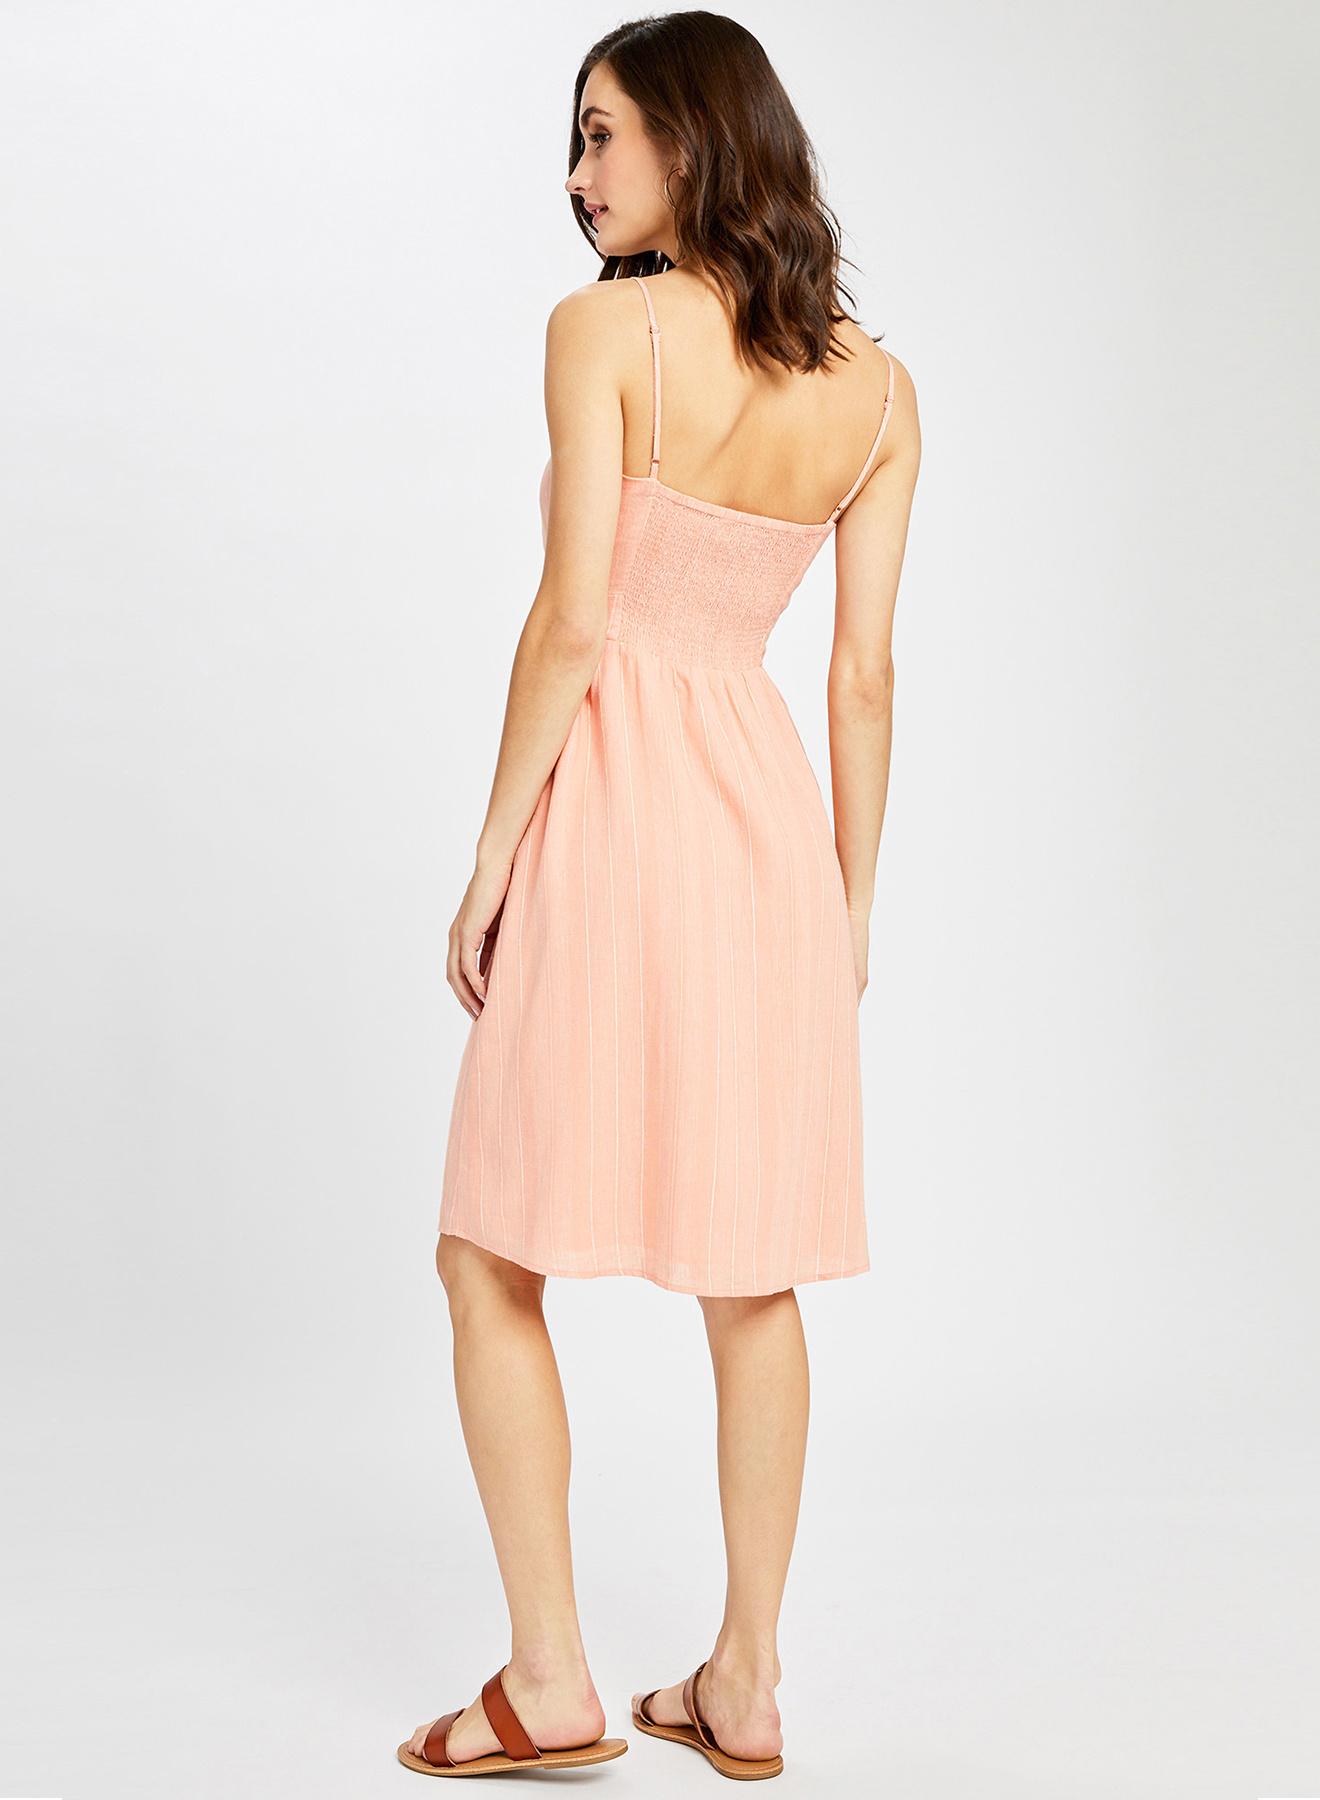 gentle fawn - theresa dress